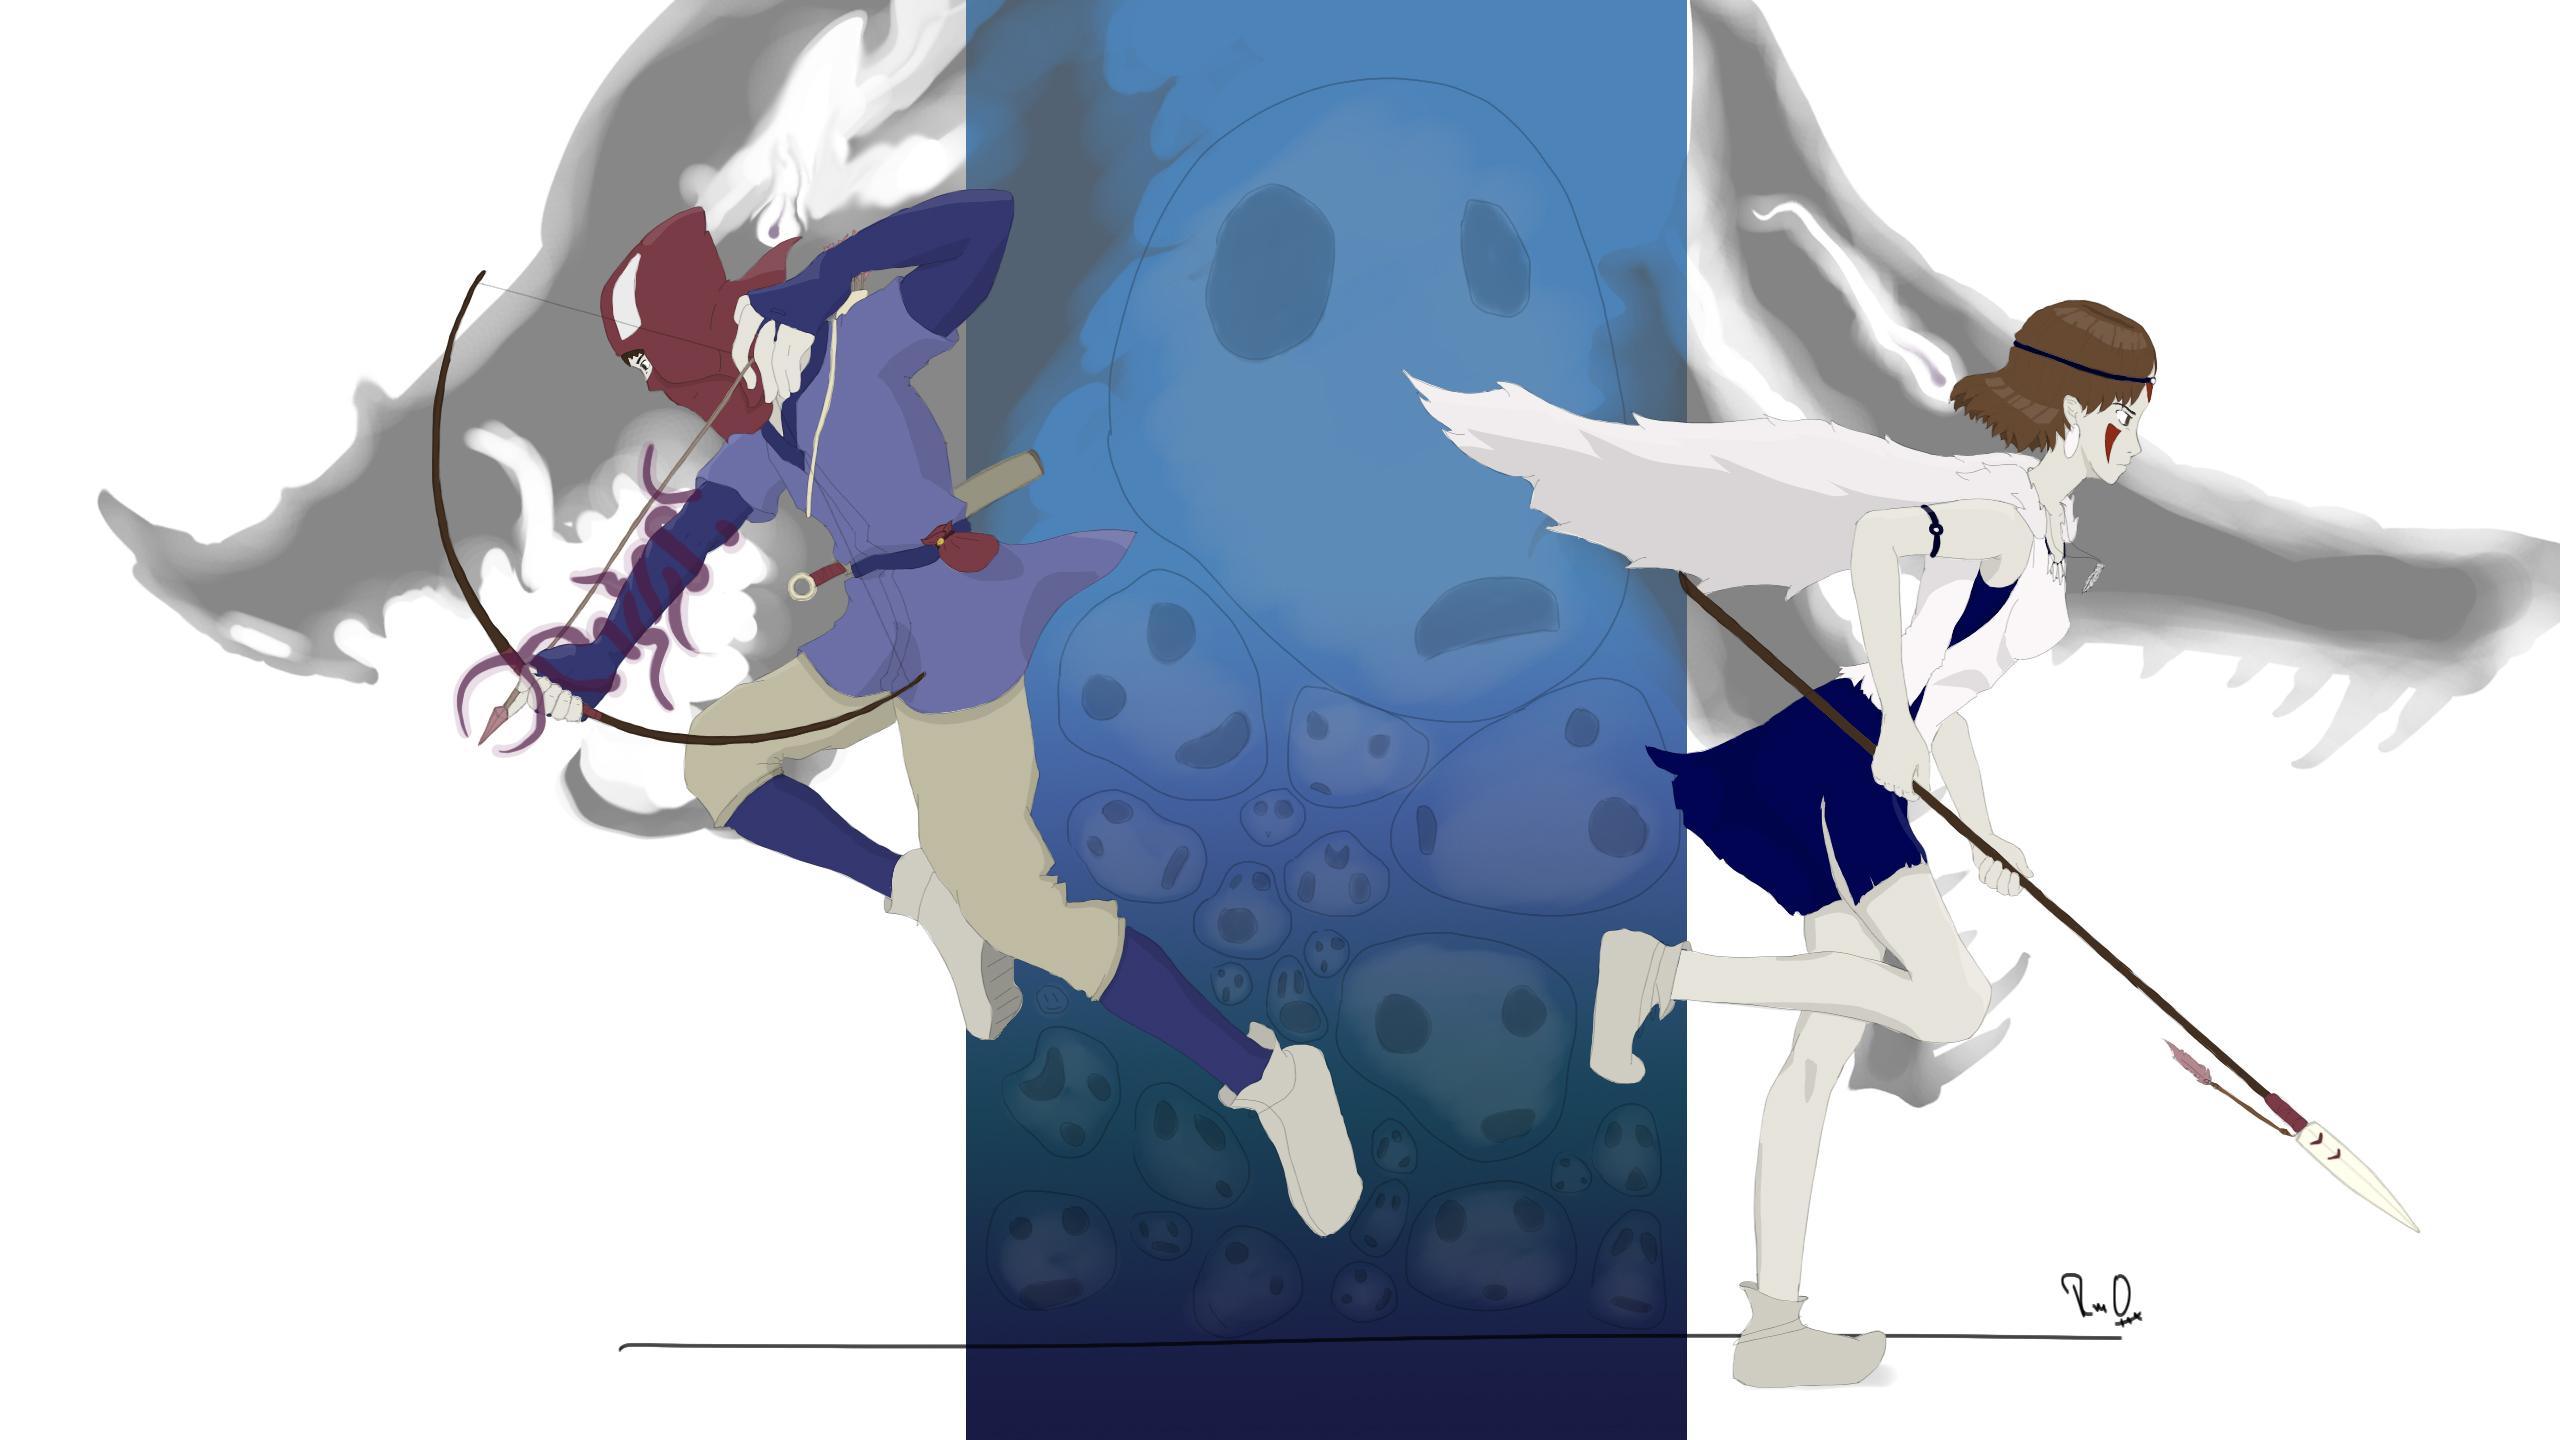 ashitaka princess mononoke characters